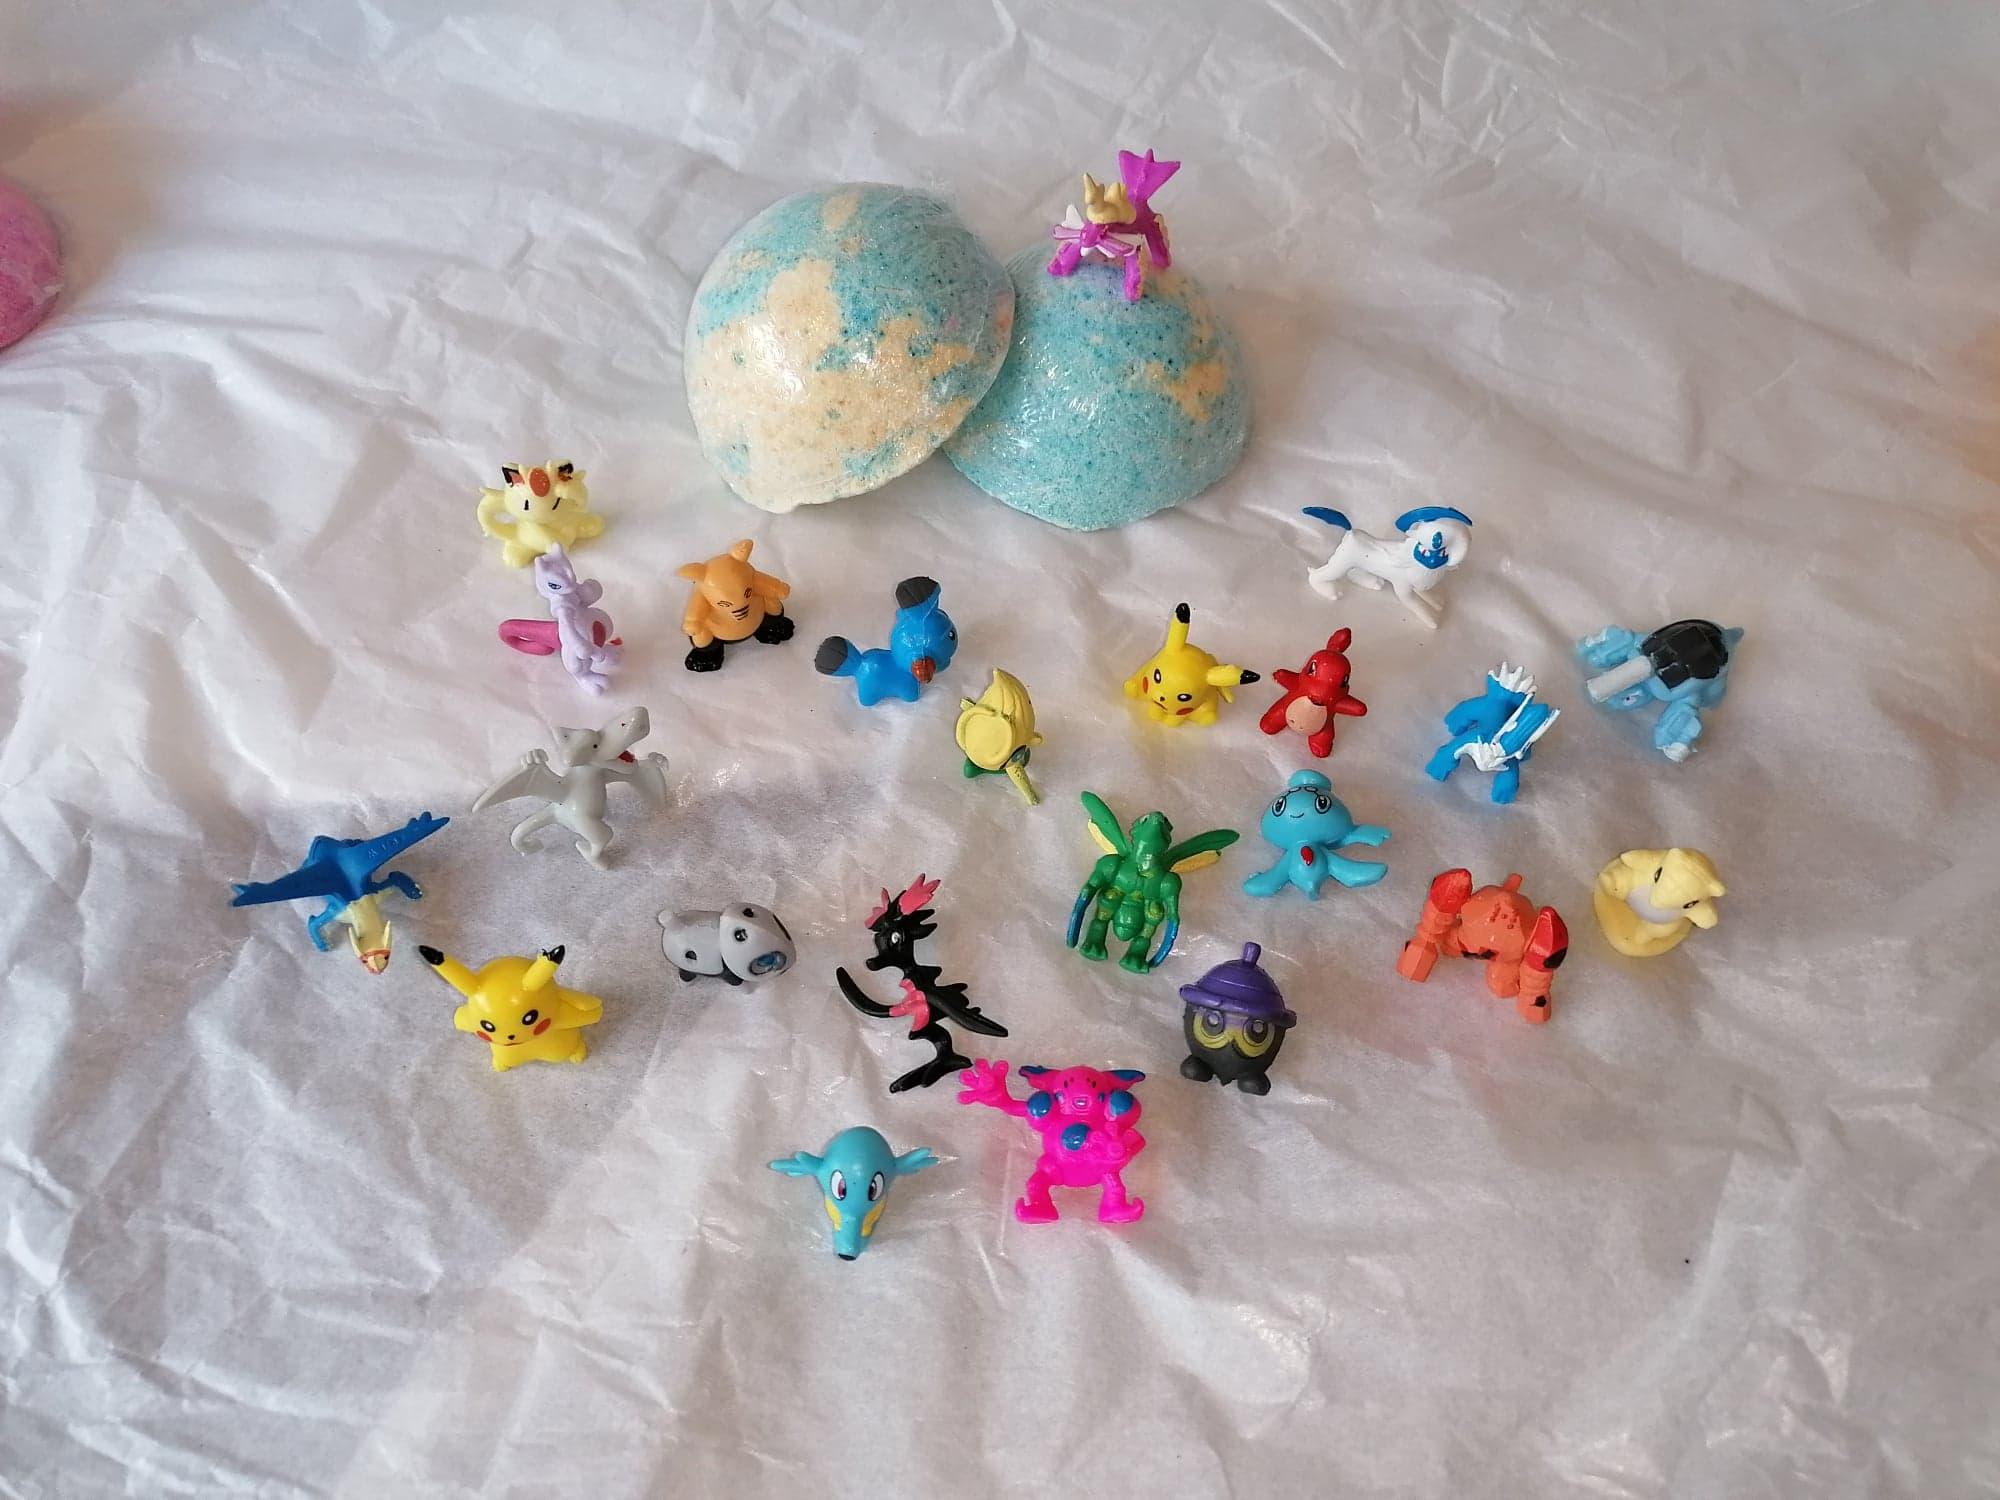 Pokemon/My Little Pony or Animals Inspired Kids Bath Bomb toys